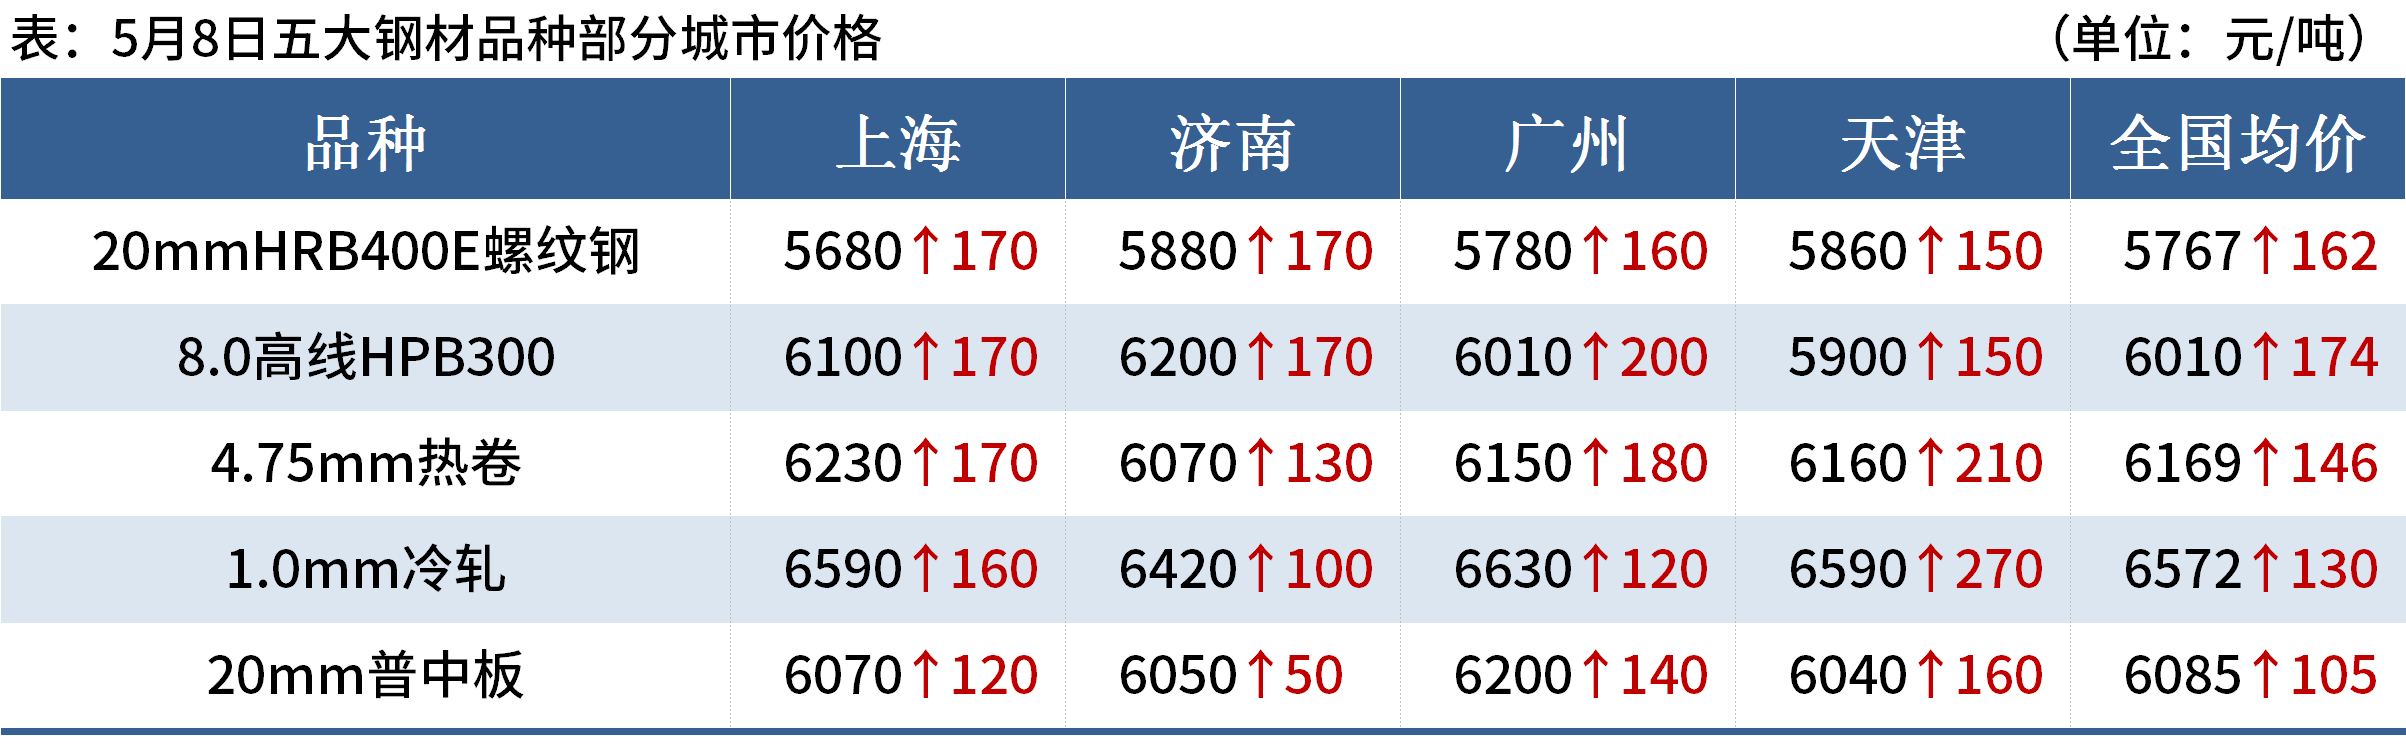 Mysteel晚餐:唐山钢坯累涨130,吨钢利润约1200(图4)